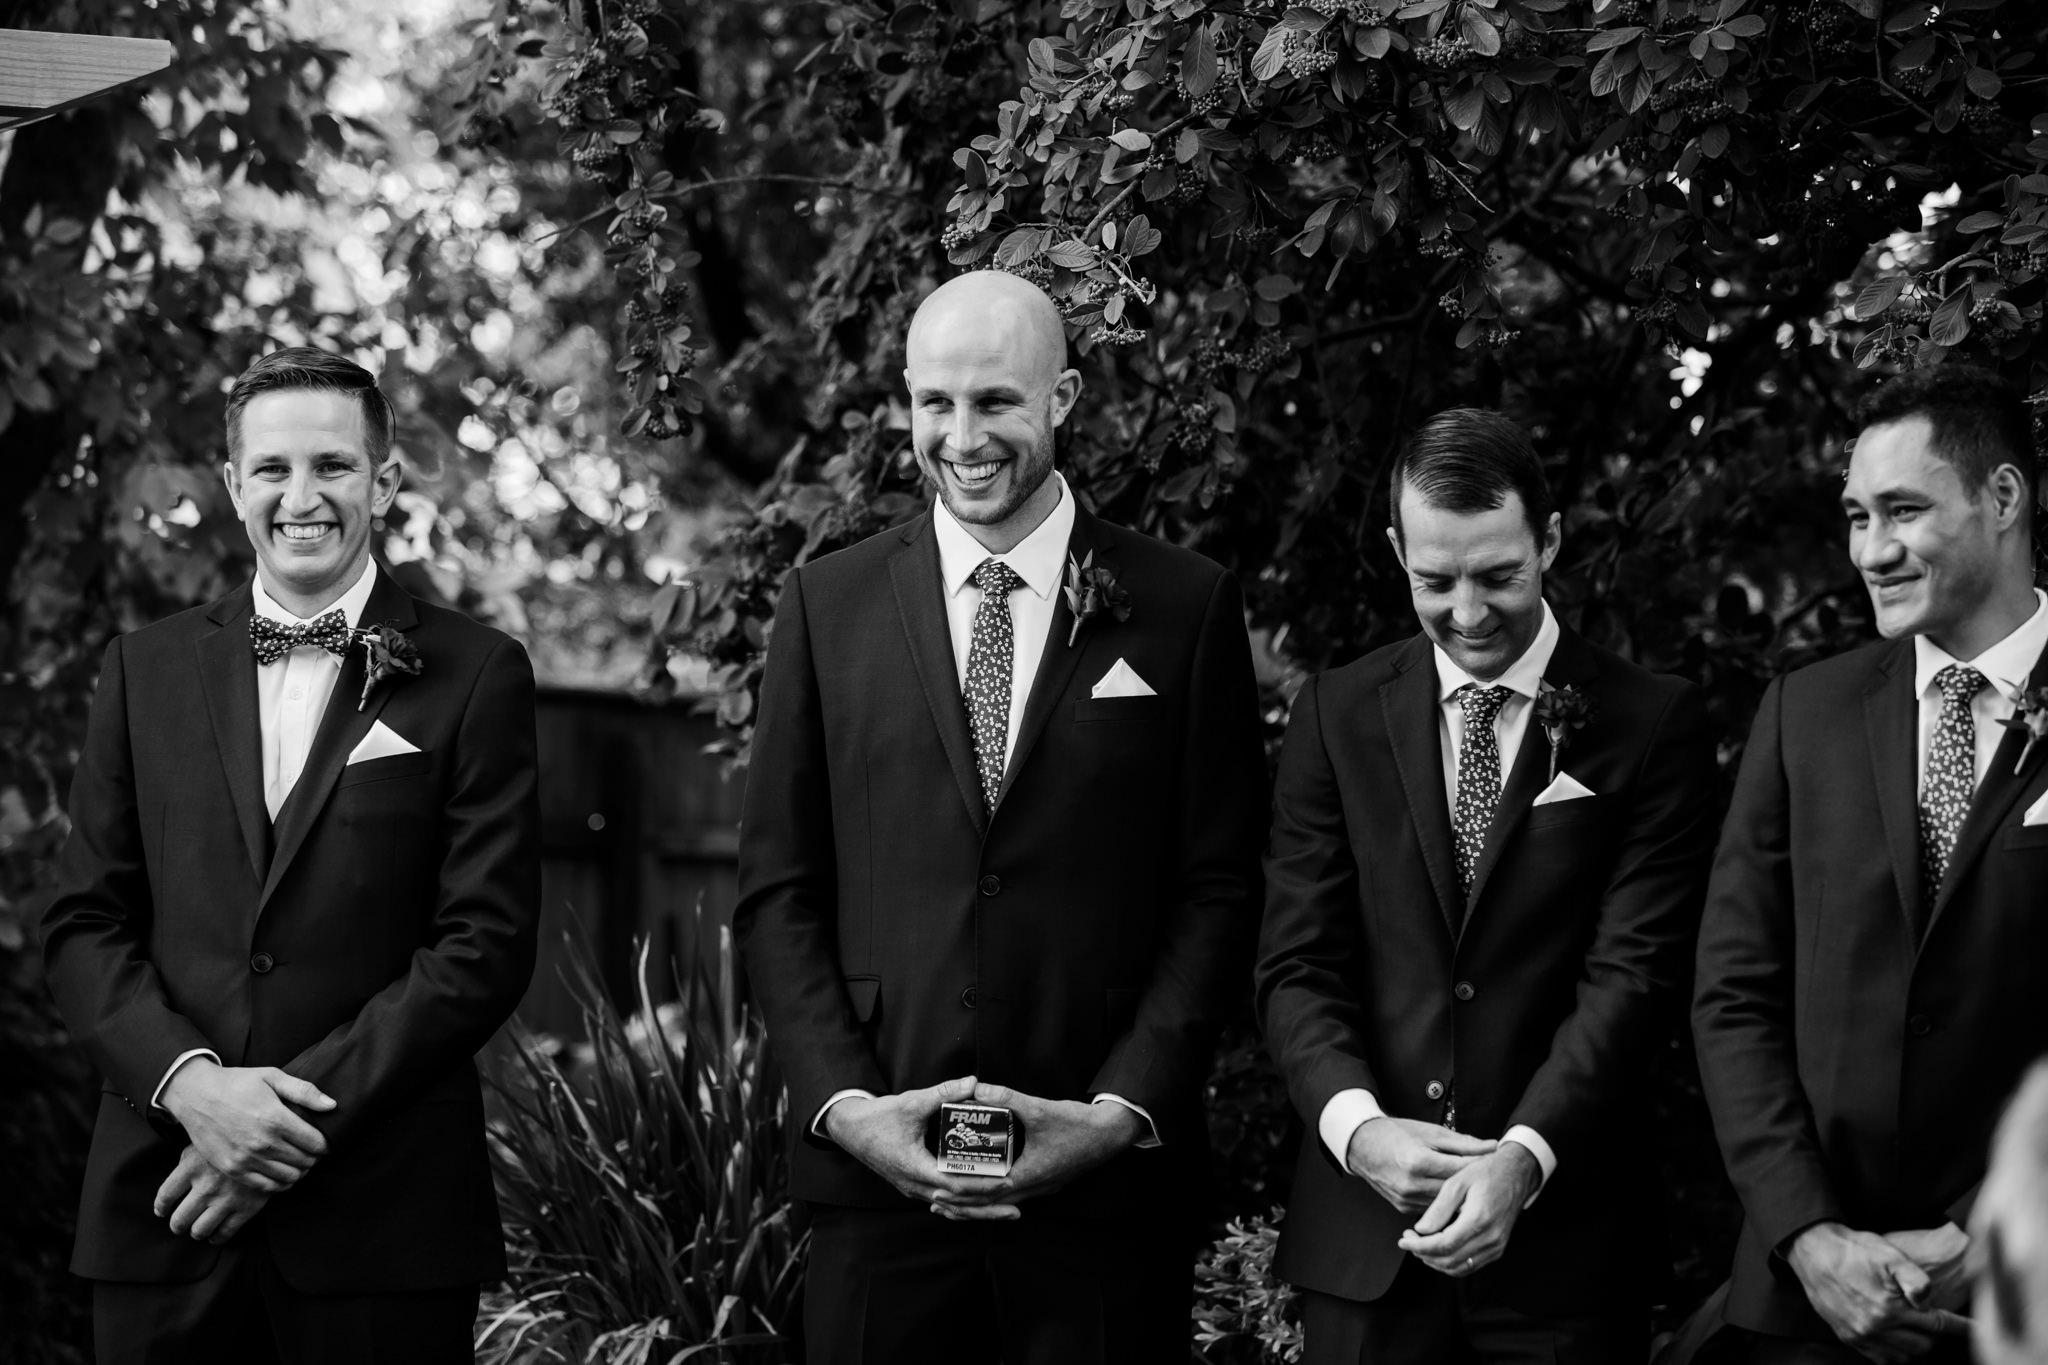 Erin Latimore Mudgee Canberra Wedding Photographer ROSEBANK GUESTHOUSE OLD THEATRE TONIC MILLTHORPE_149.JPG